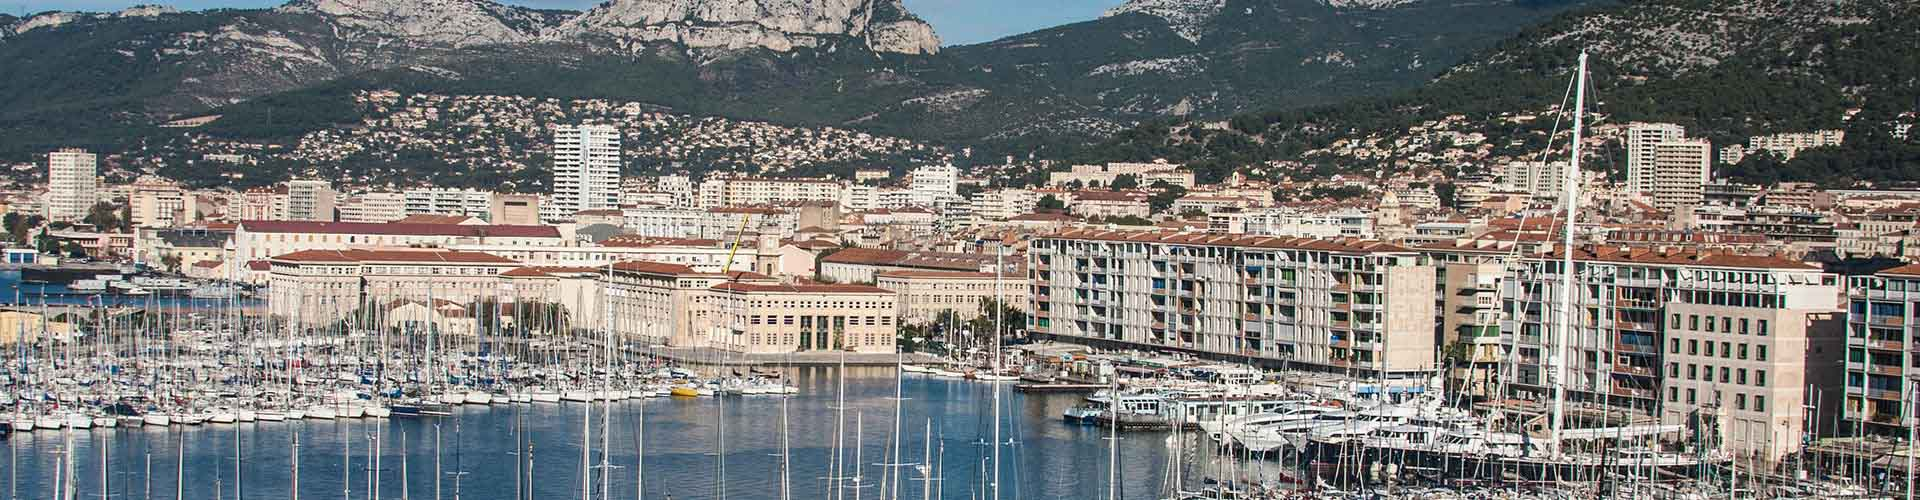 Toulon - Hostales en Toulon. Mapas de Toulon, Fotos y comentarios de cada Hostal en Toulon.